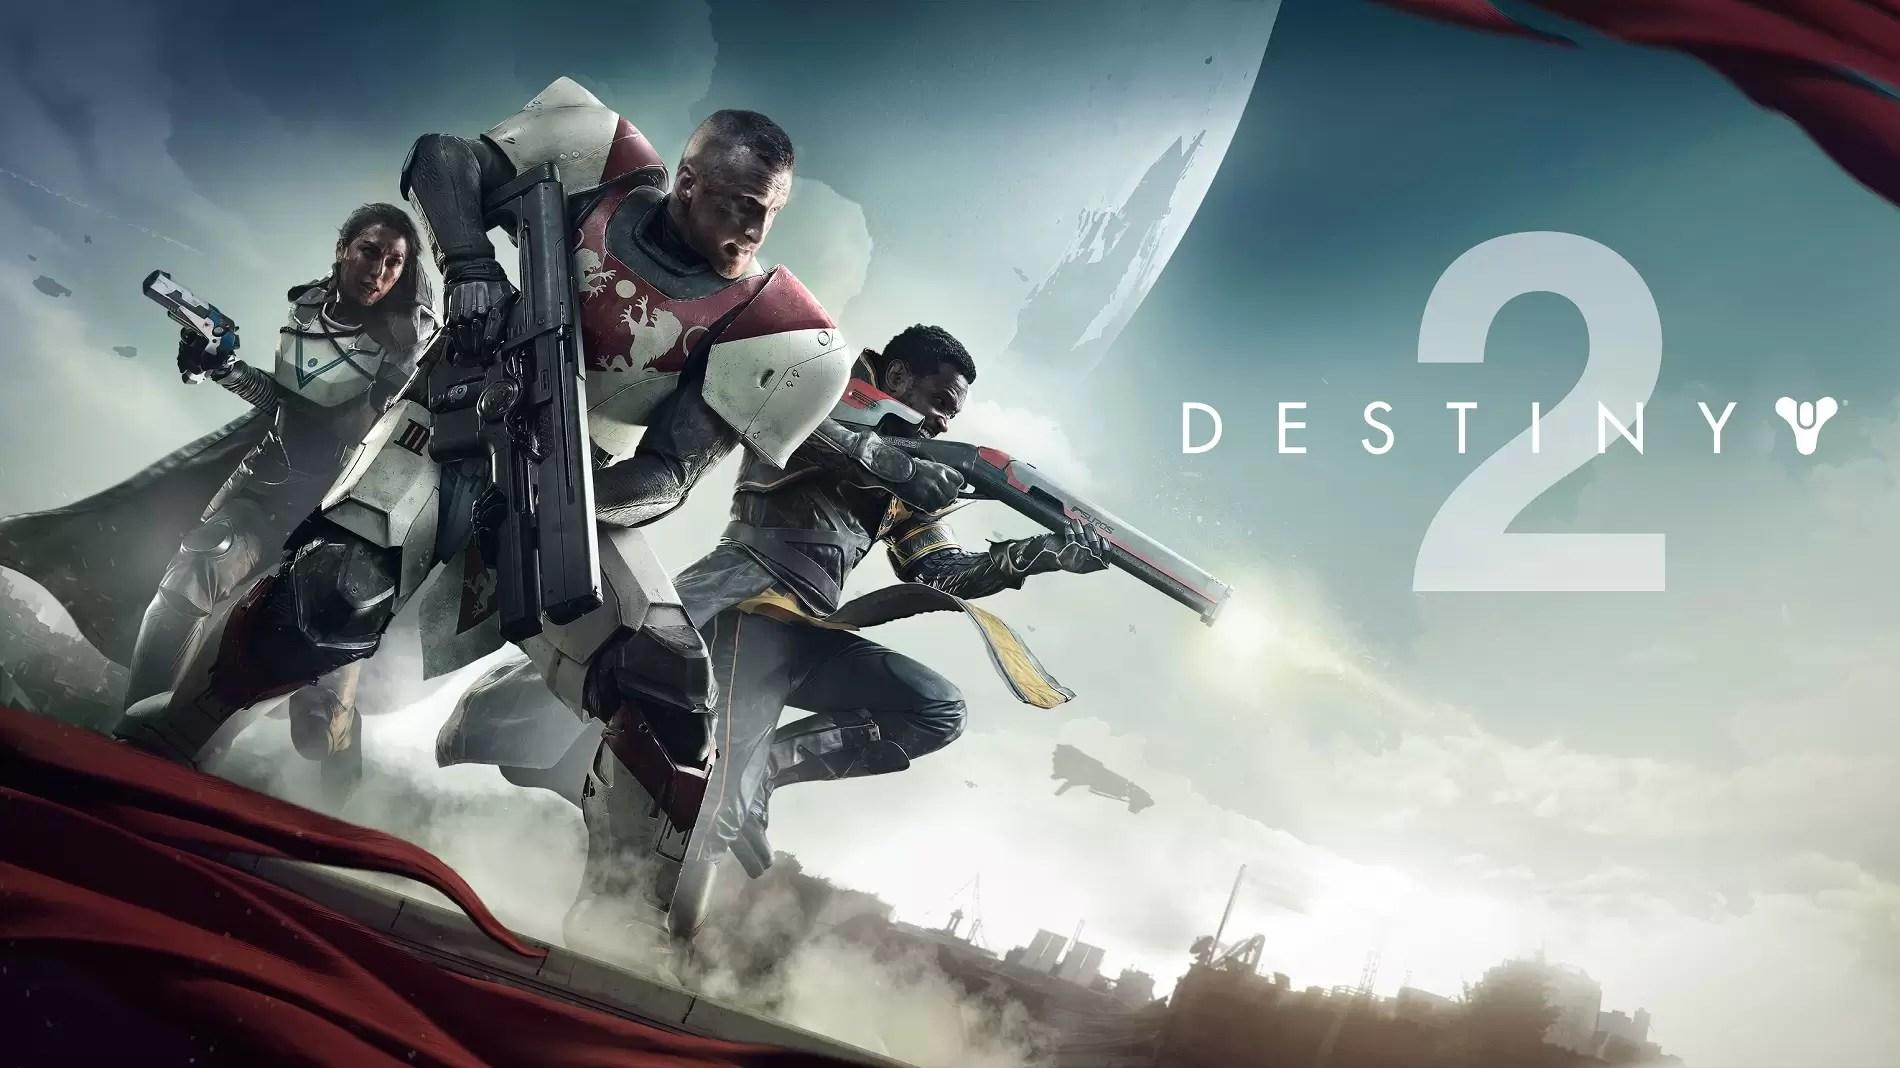 Prvi utisci: Destiny 2